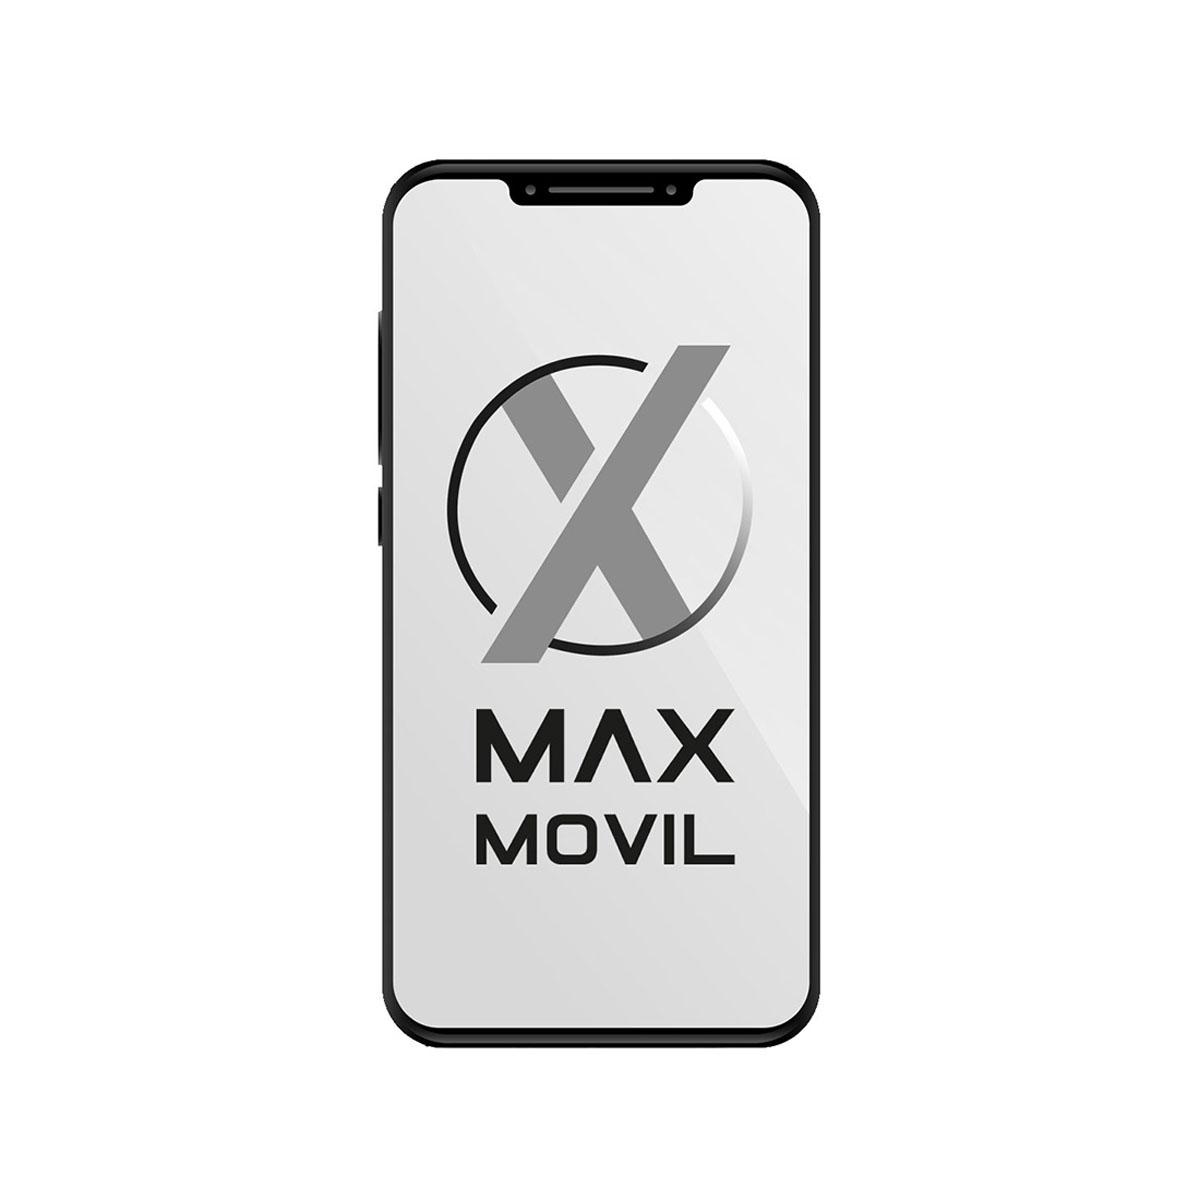 Apple Watch Series 5 GPS + Celular, Caja 40mm Aluminio Gris espacial y correa deportiva negra MWX32TY/A